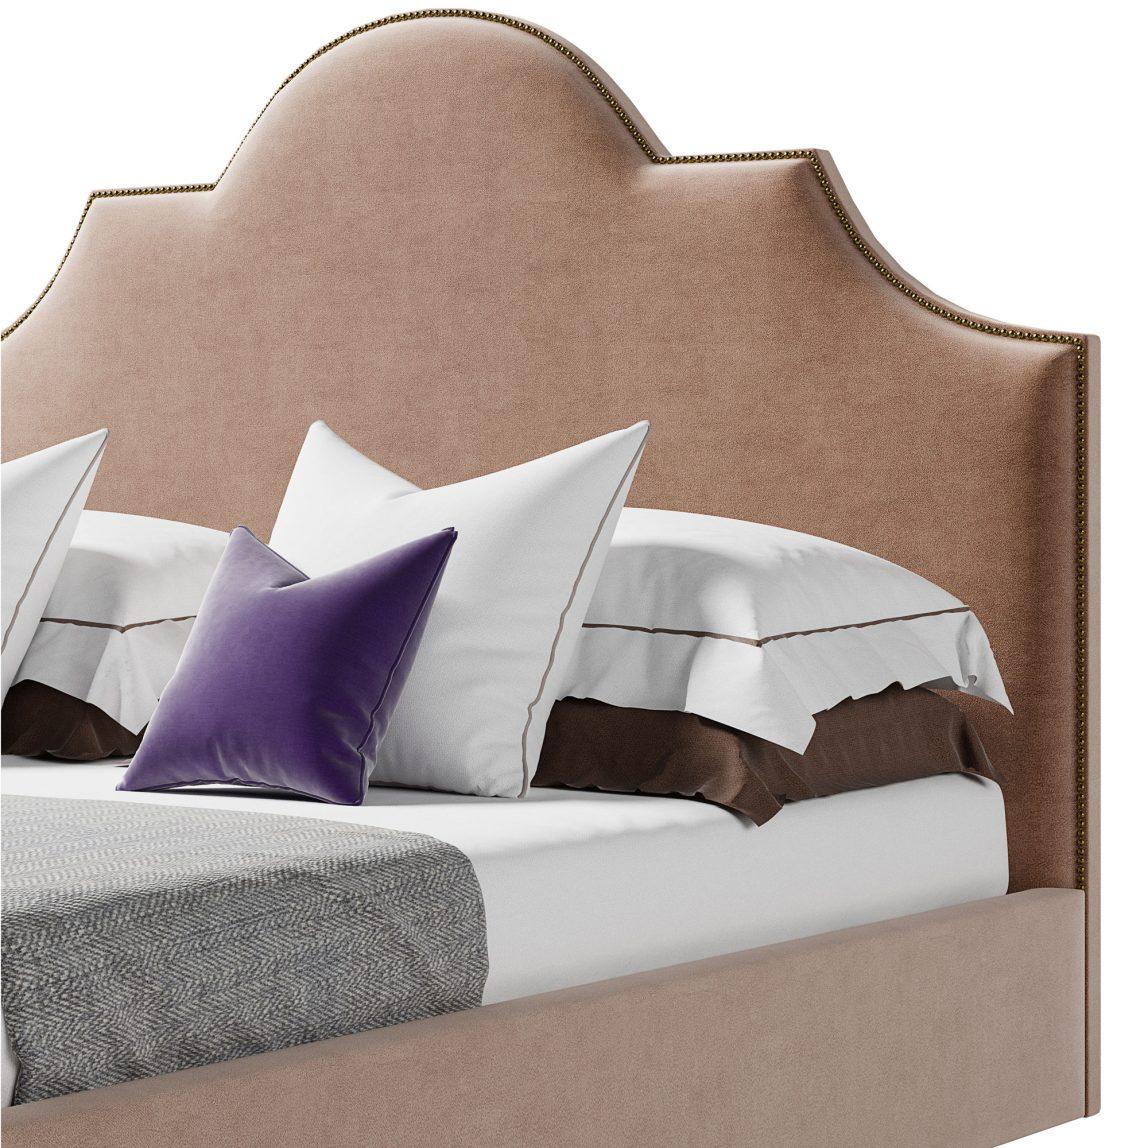 Изголовье кровати Шелдон